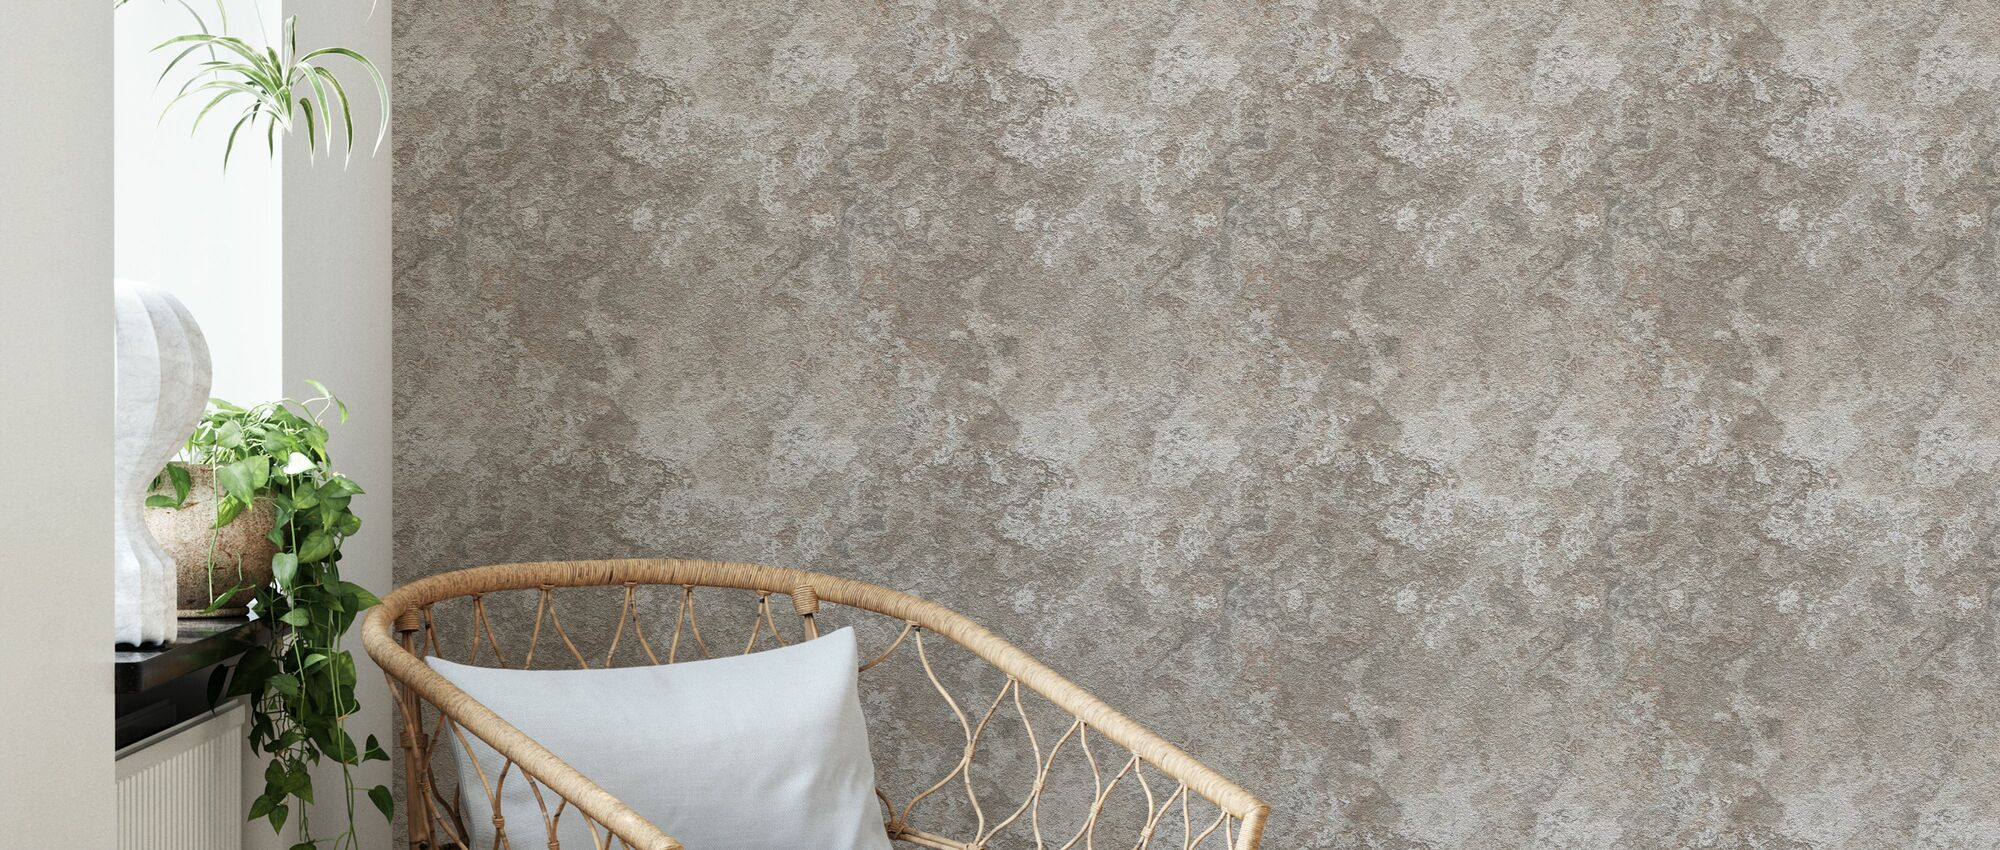 Old Plaster Concrete - Wallpaper - Living Room